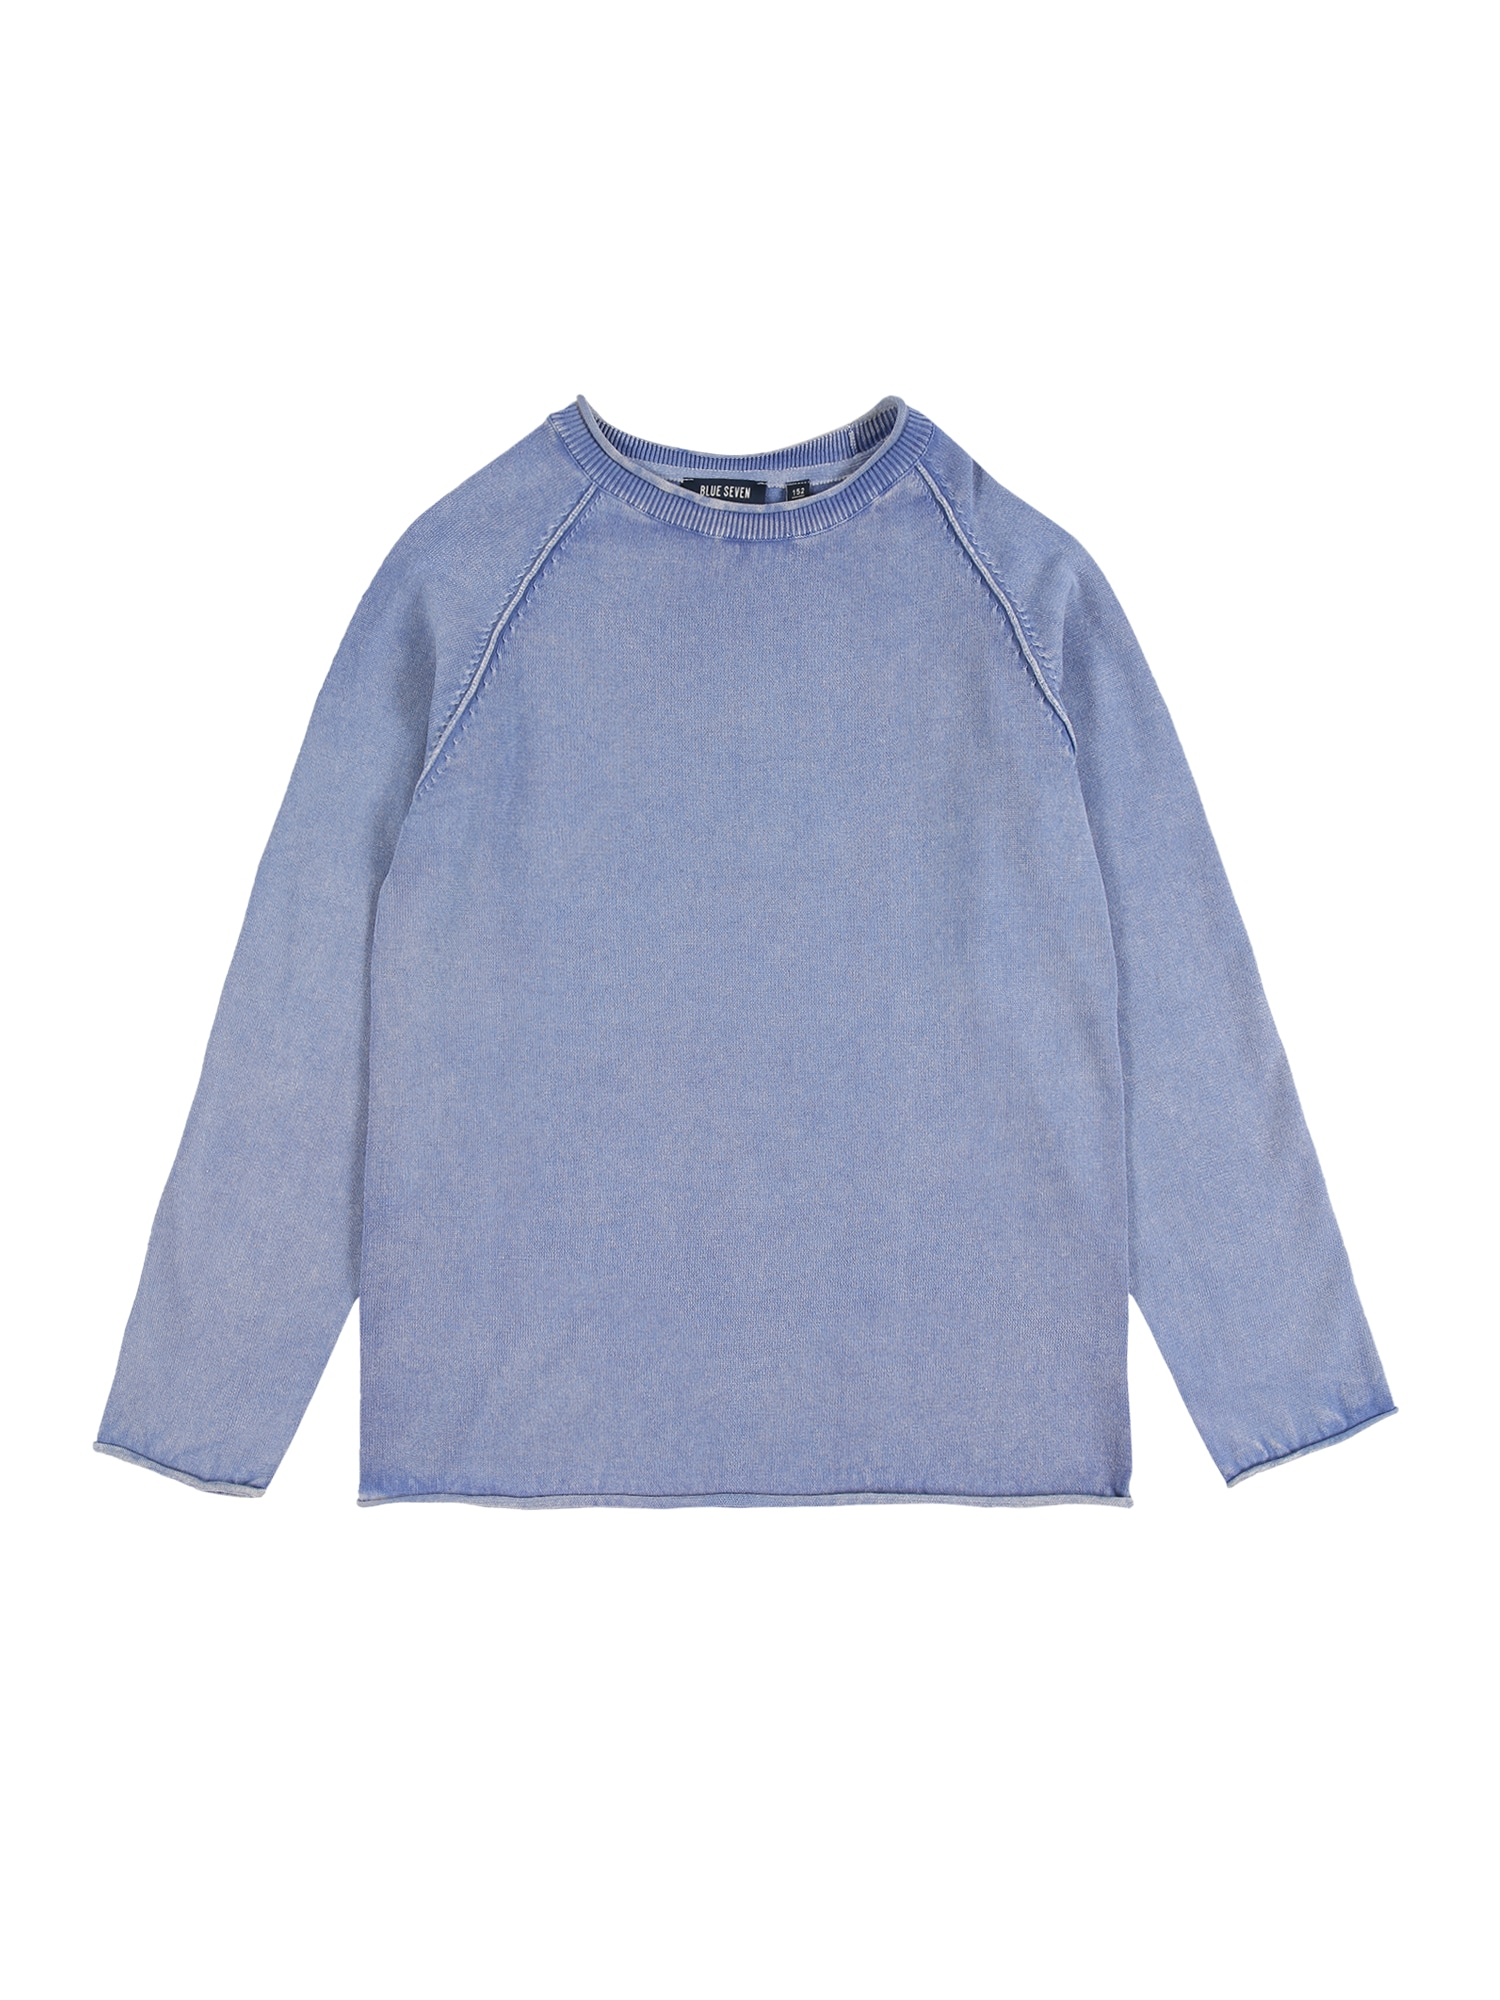 BLUE SEVEN Megztinis mėlyna dūmų spalva